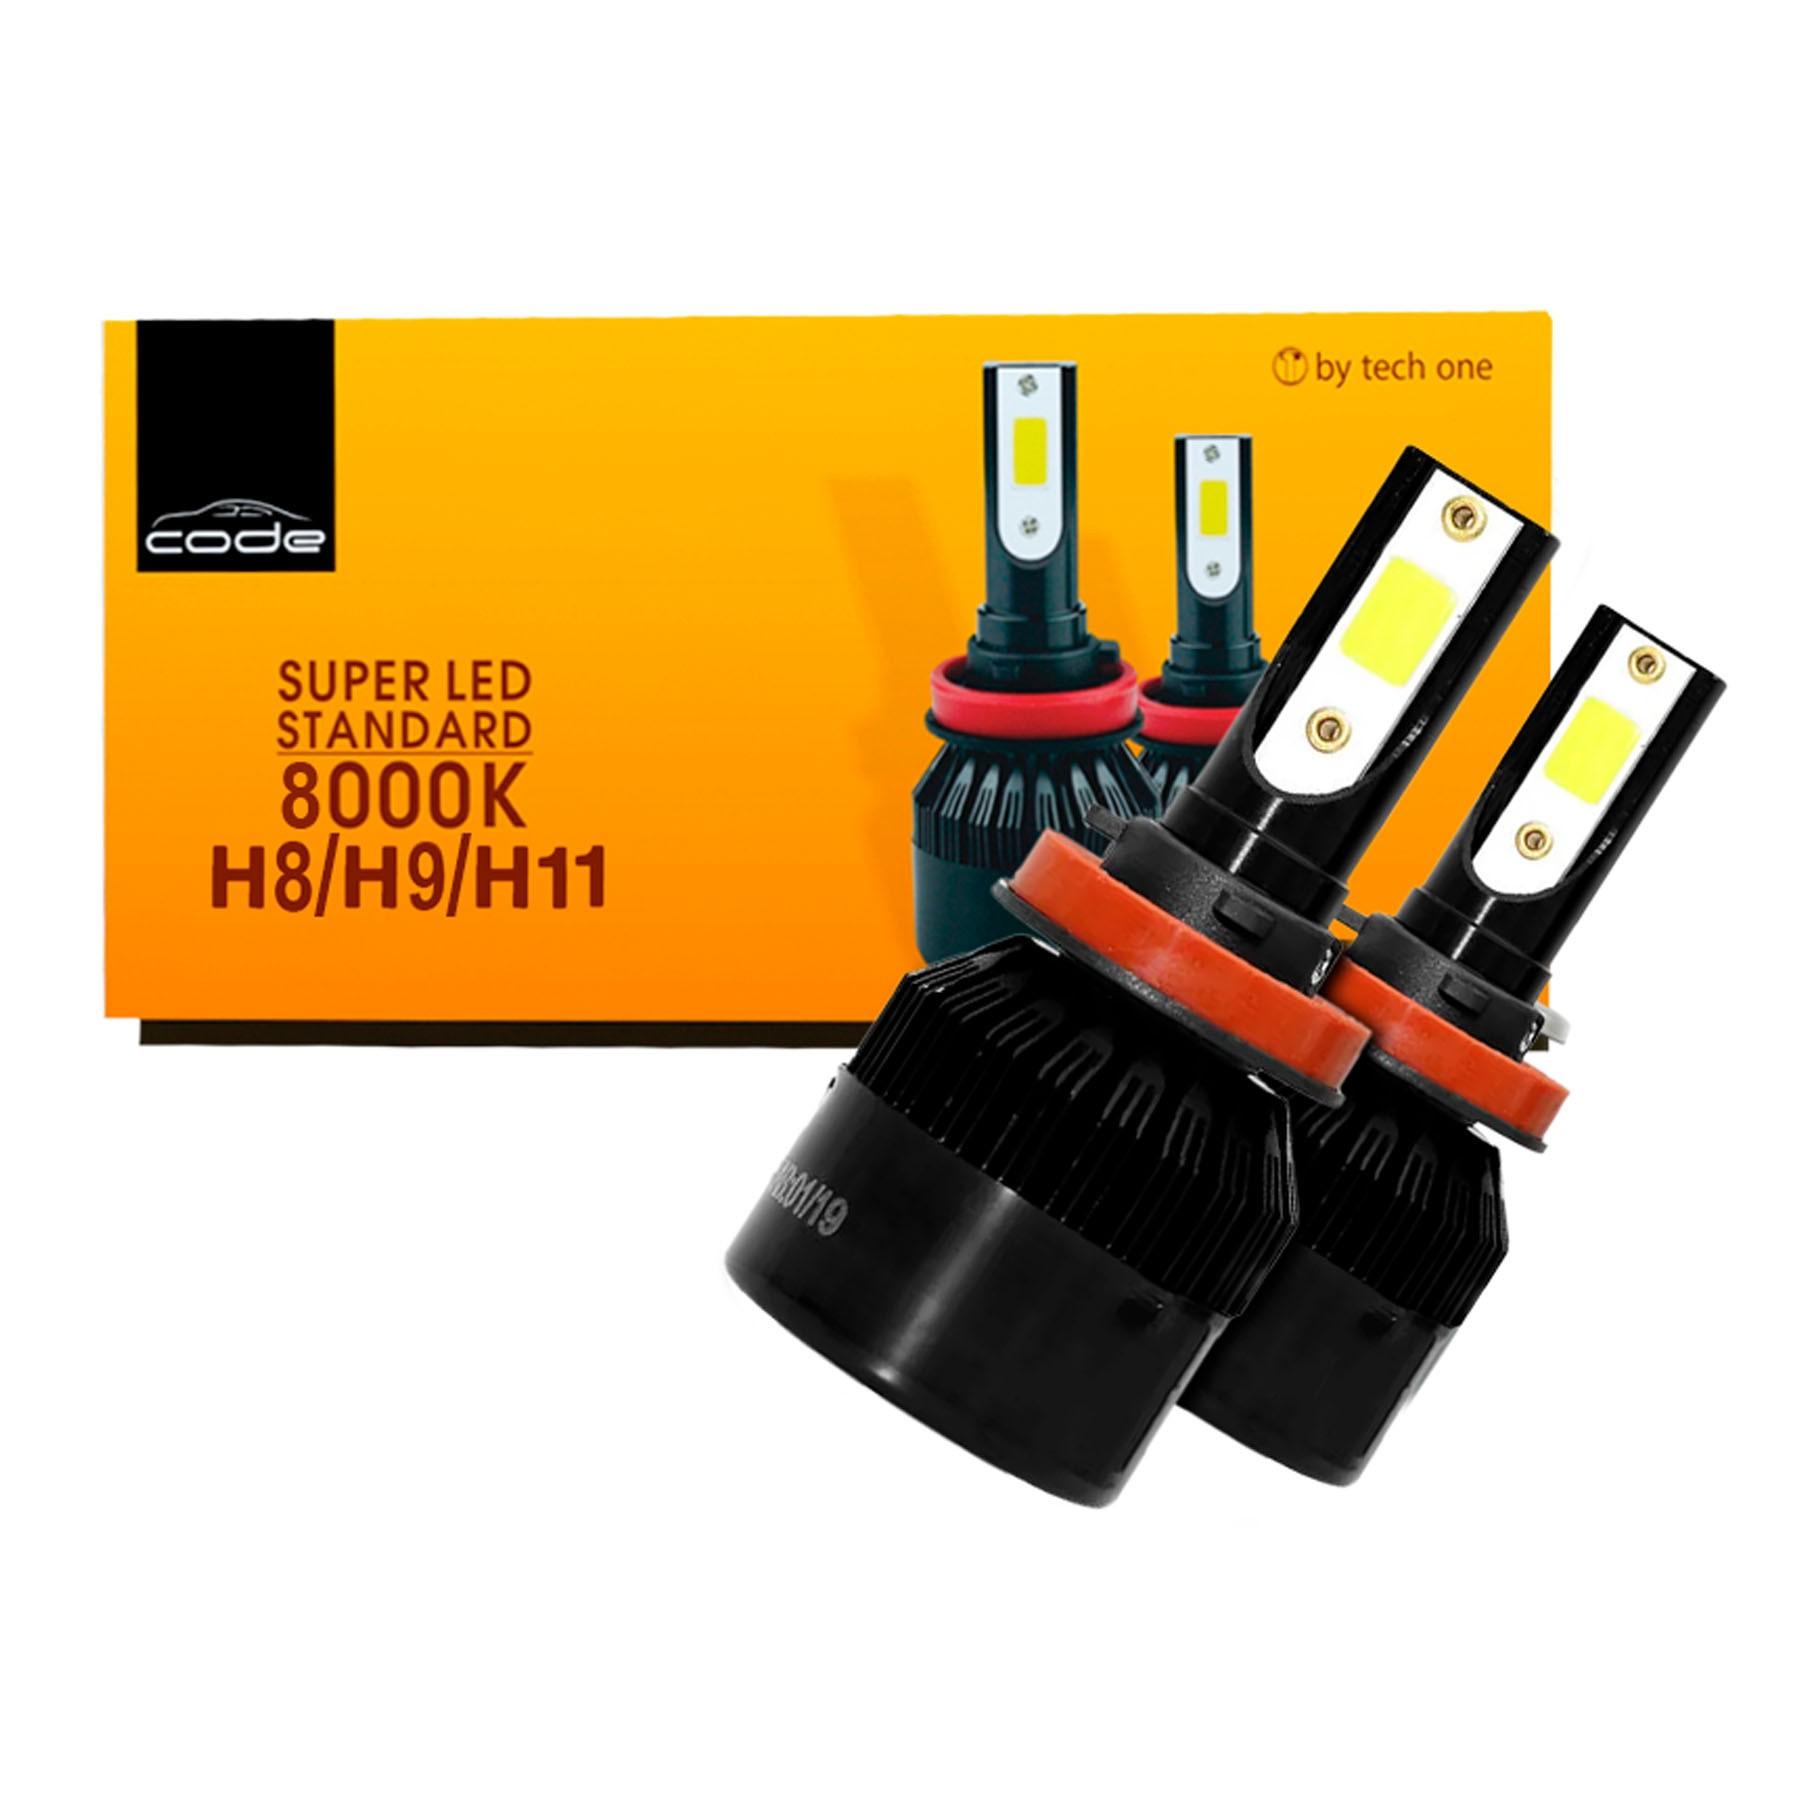 Par Lâmpada Super LED Flip Cob Standard H8 H9 H11 6000K 74W 12V 24V